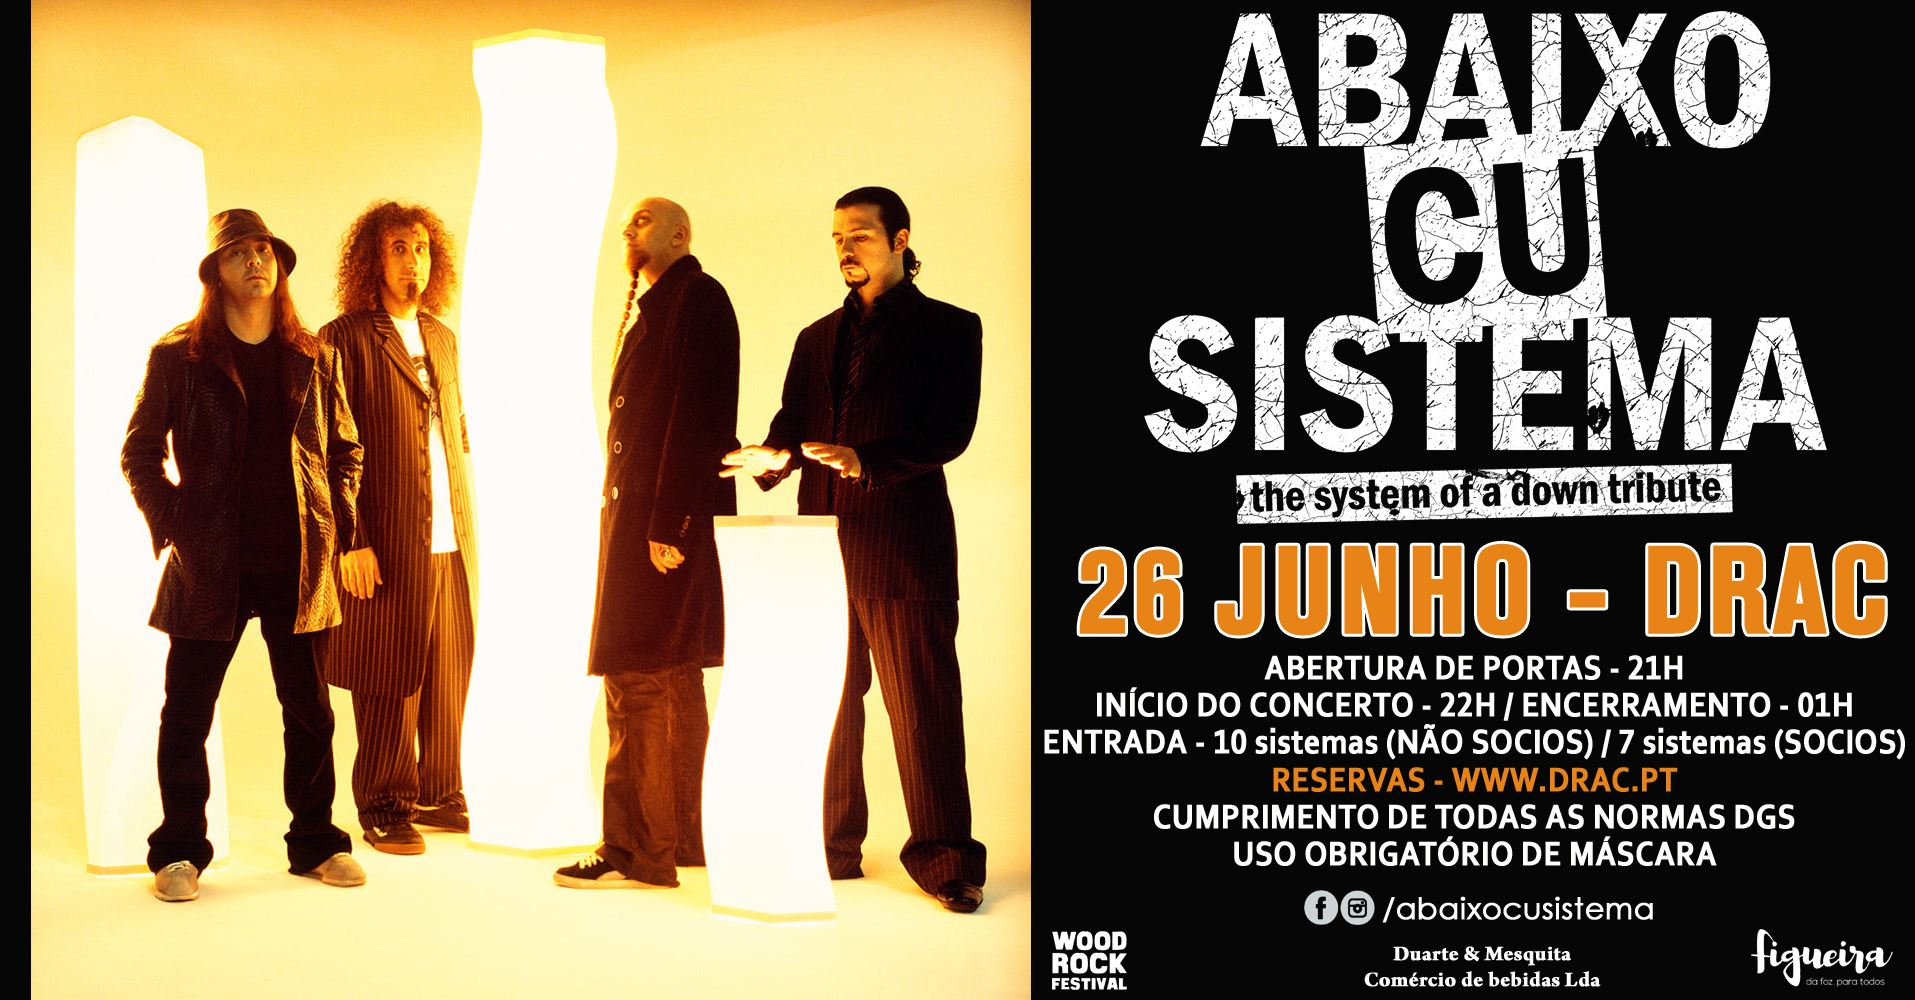 Abaixo Cu Sistema - The SYSTEM OF A DOWN Tribute / 26 JUNHO / DRAC - Figueira da Foz